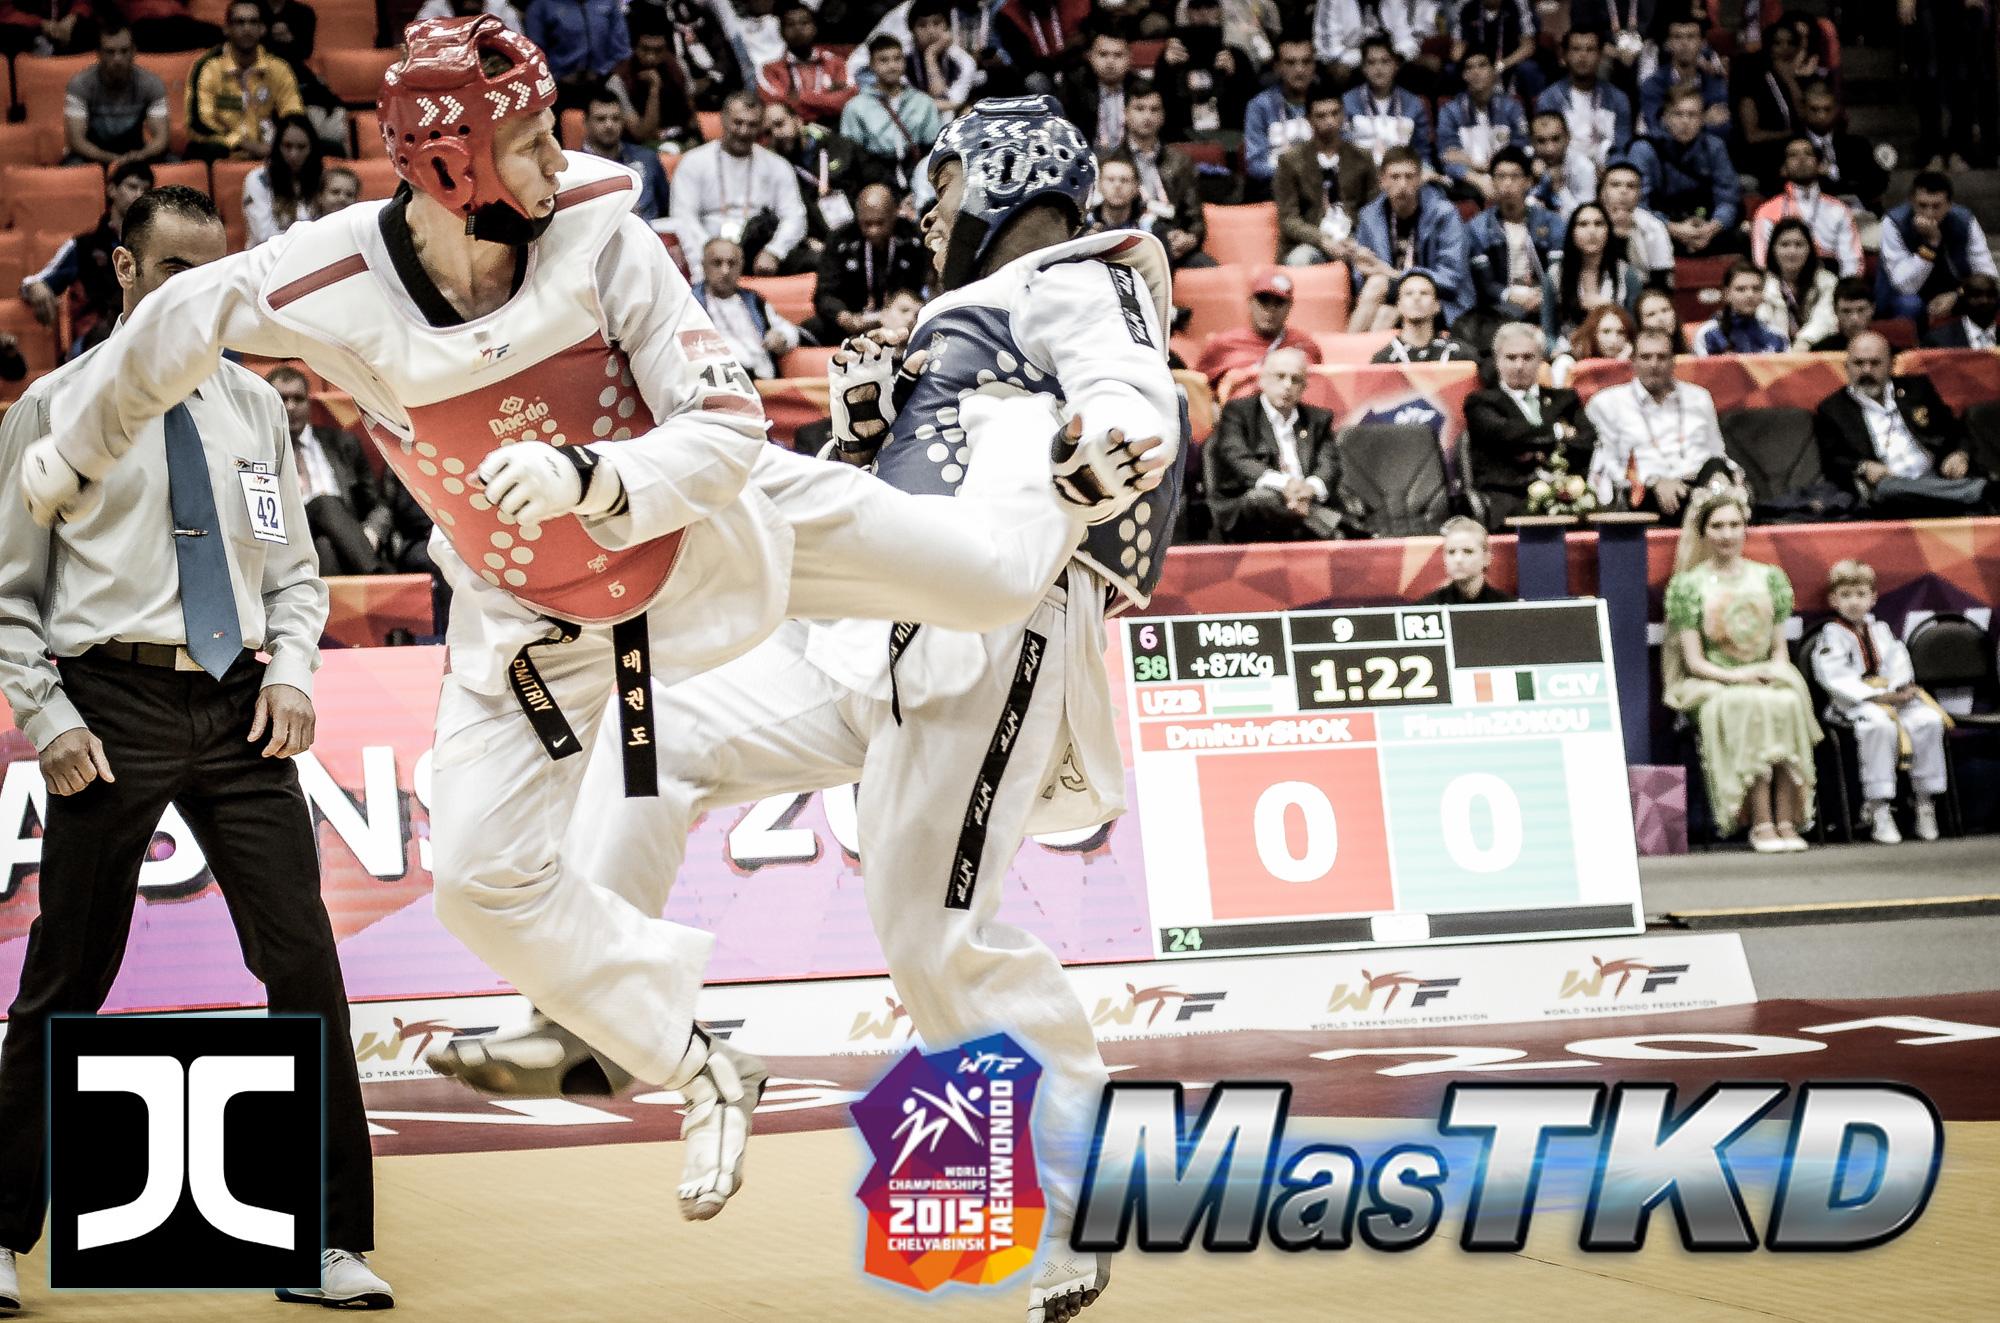 16_Mundial-Taekwondo_JCalicu-Seleccion-Mejor-Foto